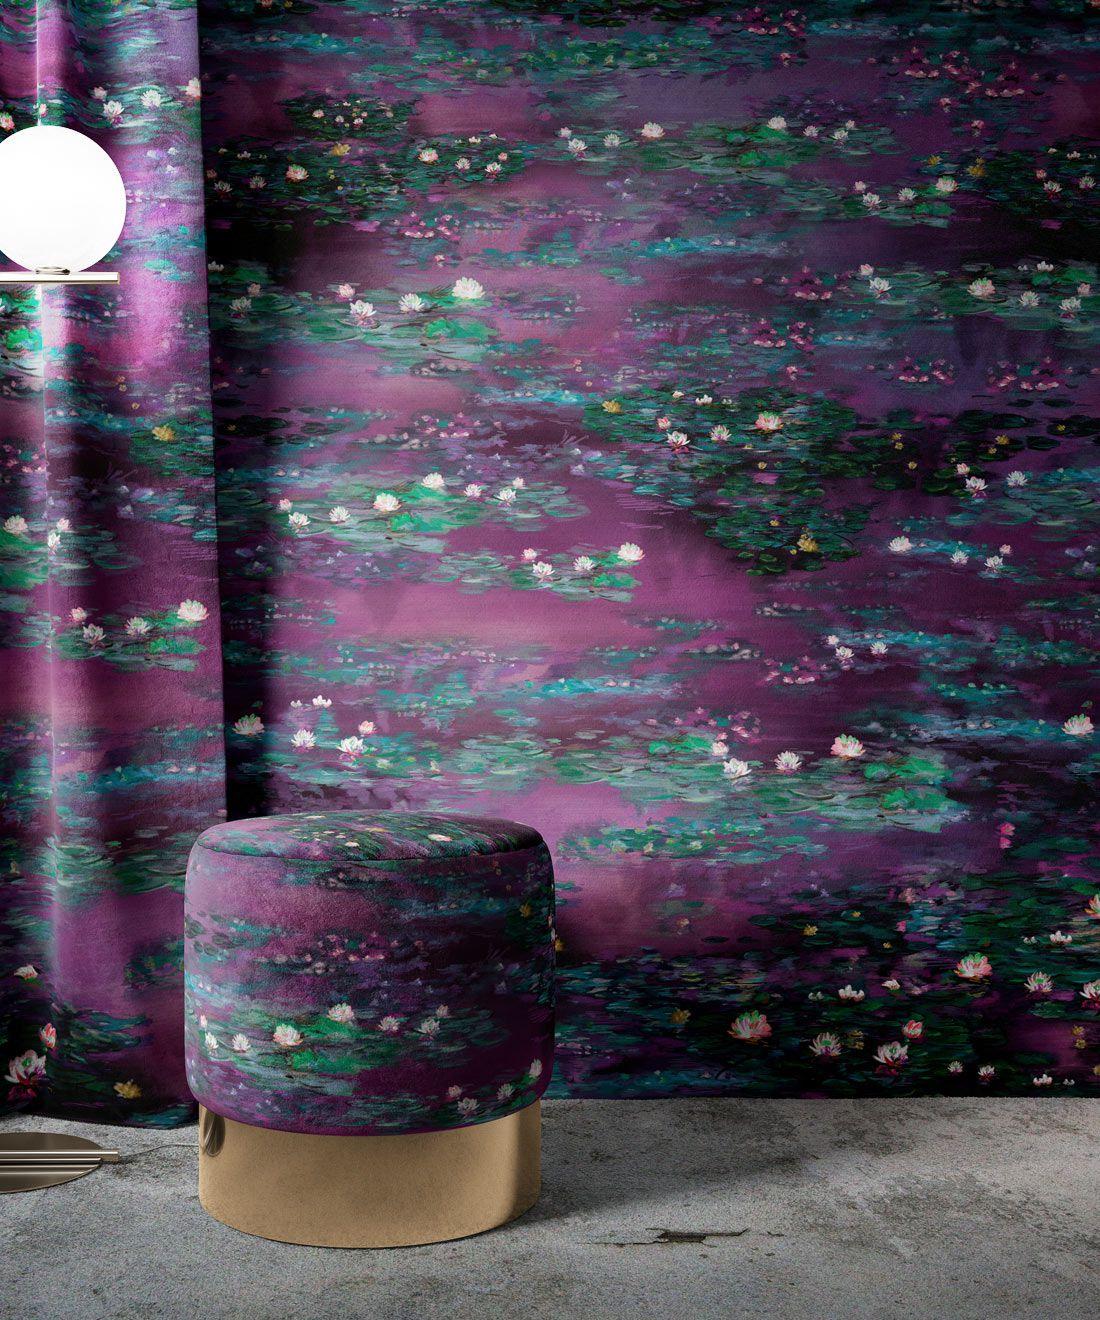 Water Lillies Wallpaper •Abstract Wallpaper • Dreamy Wallpaper • Violeta Wallpaper •Insitu